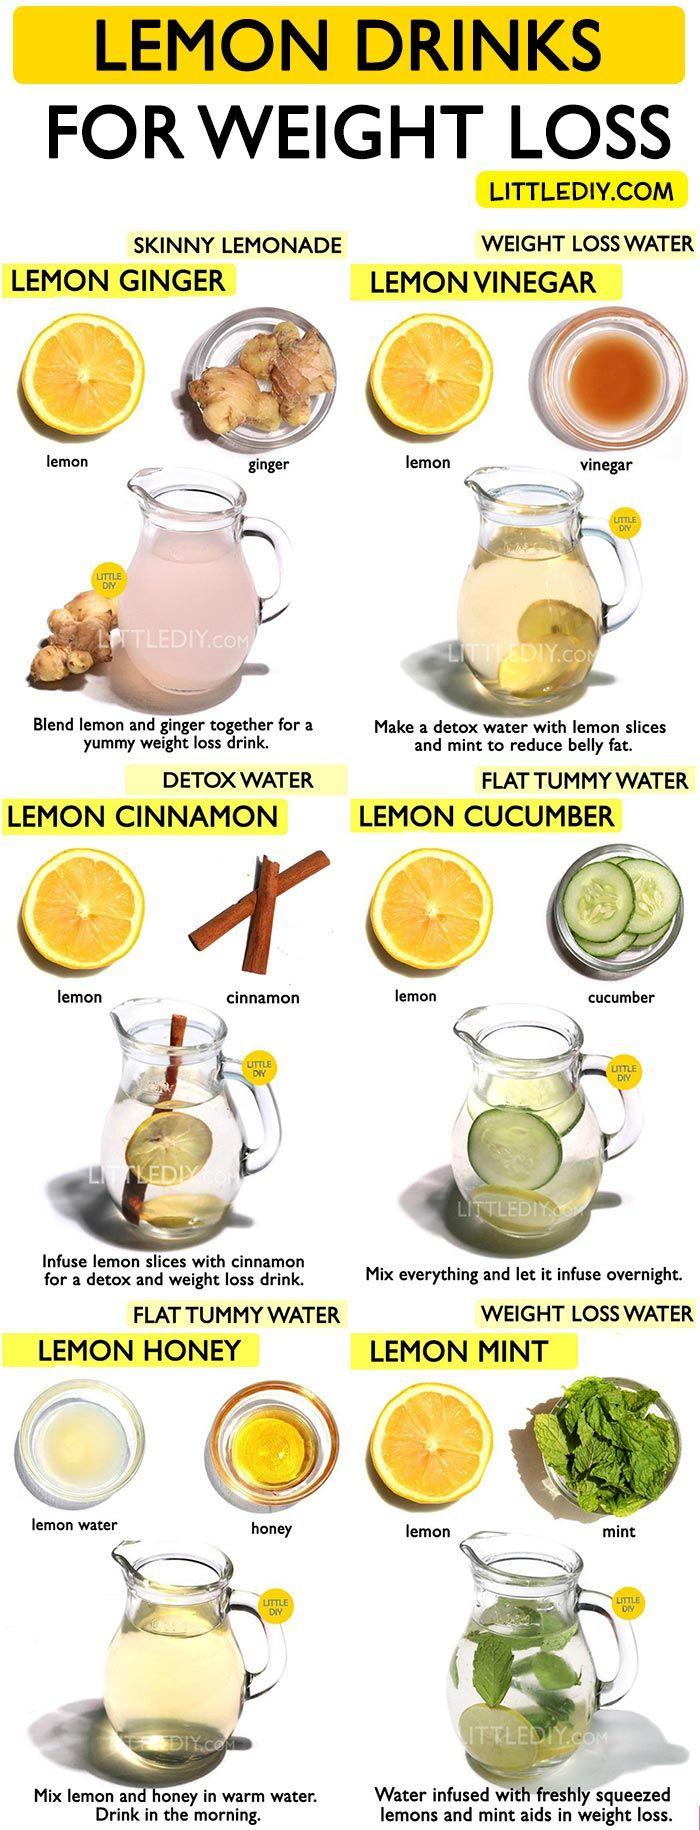 LEMON DRINKS RECIPE for weight loss #weightloss